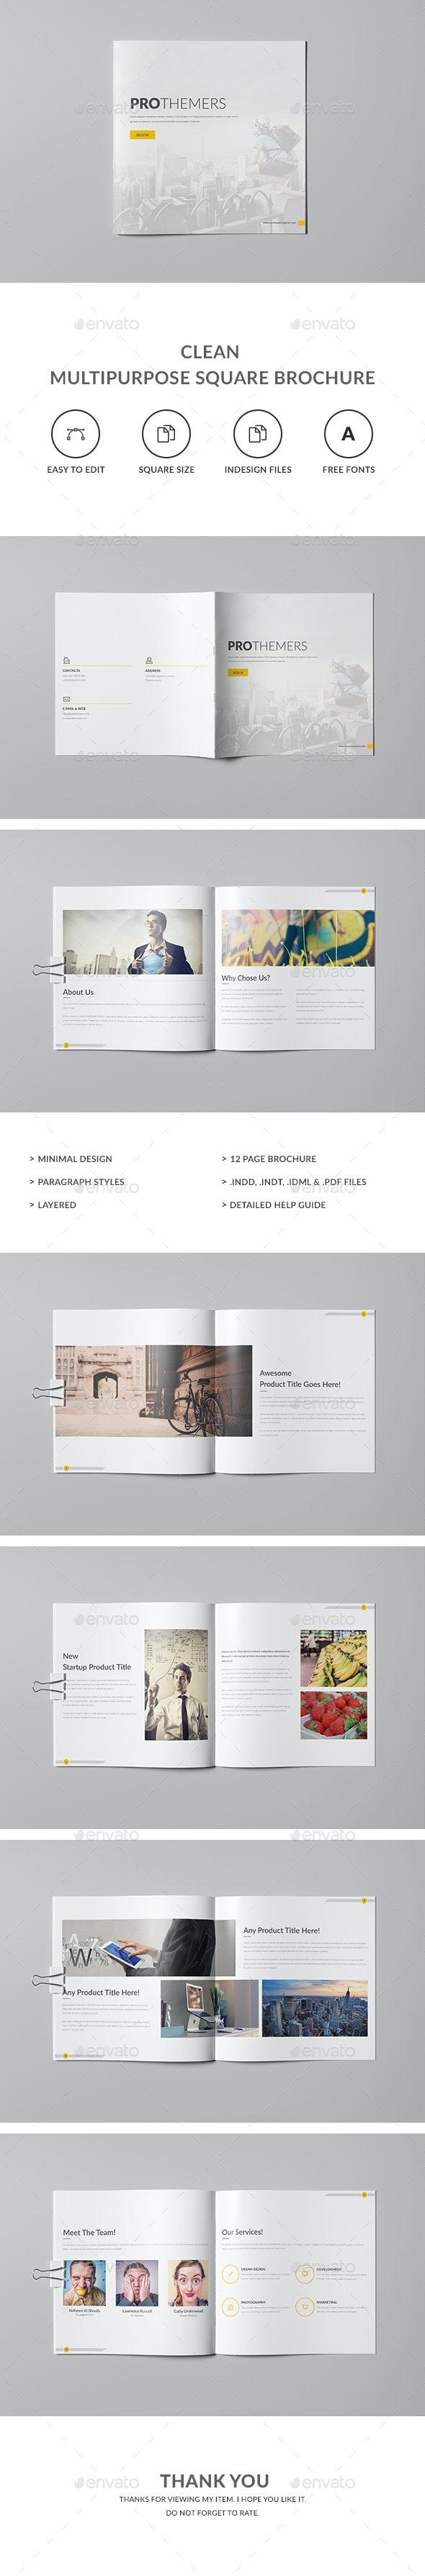 Clean Multipurpose Square Brochure Template - Corporate Brochures